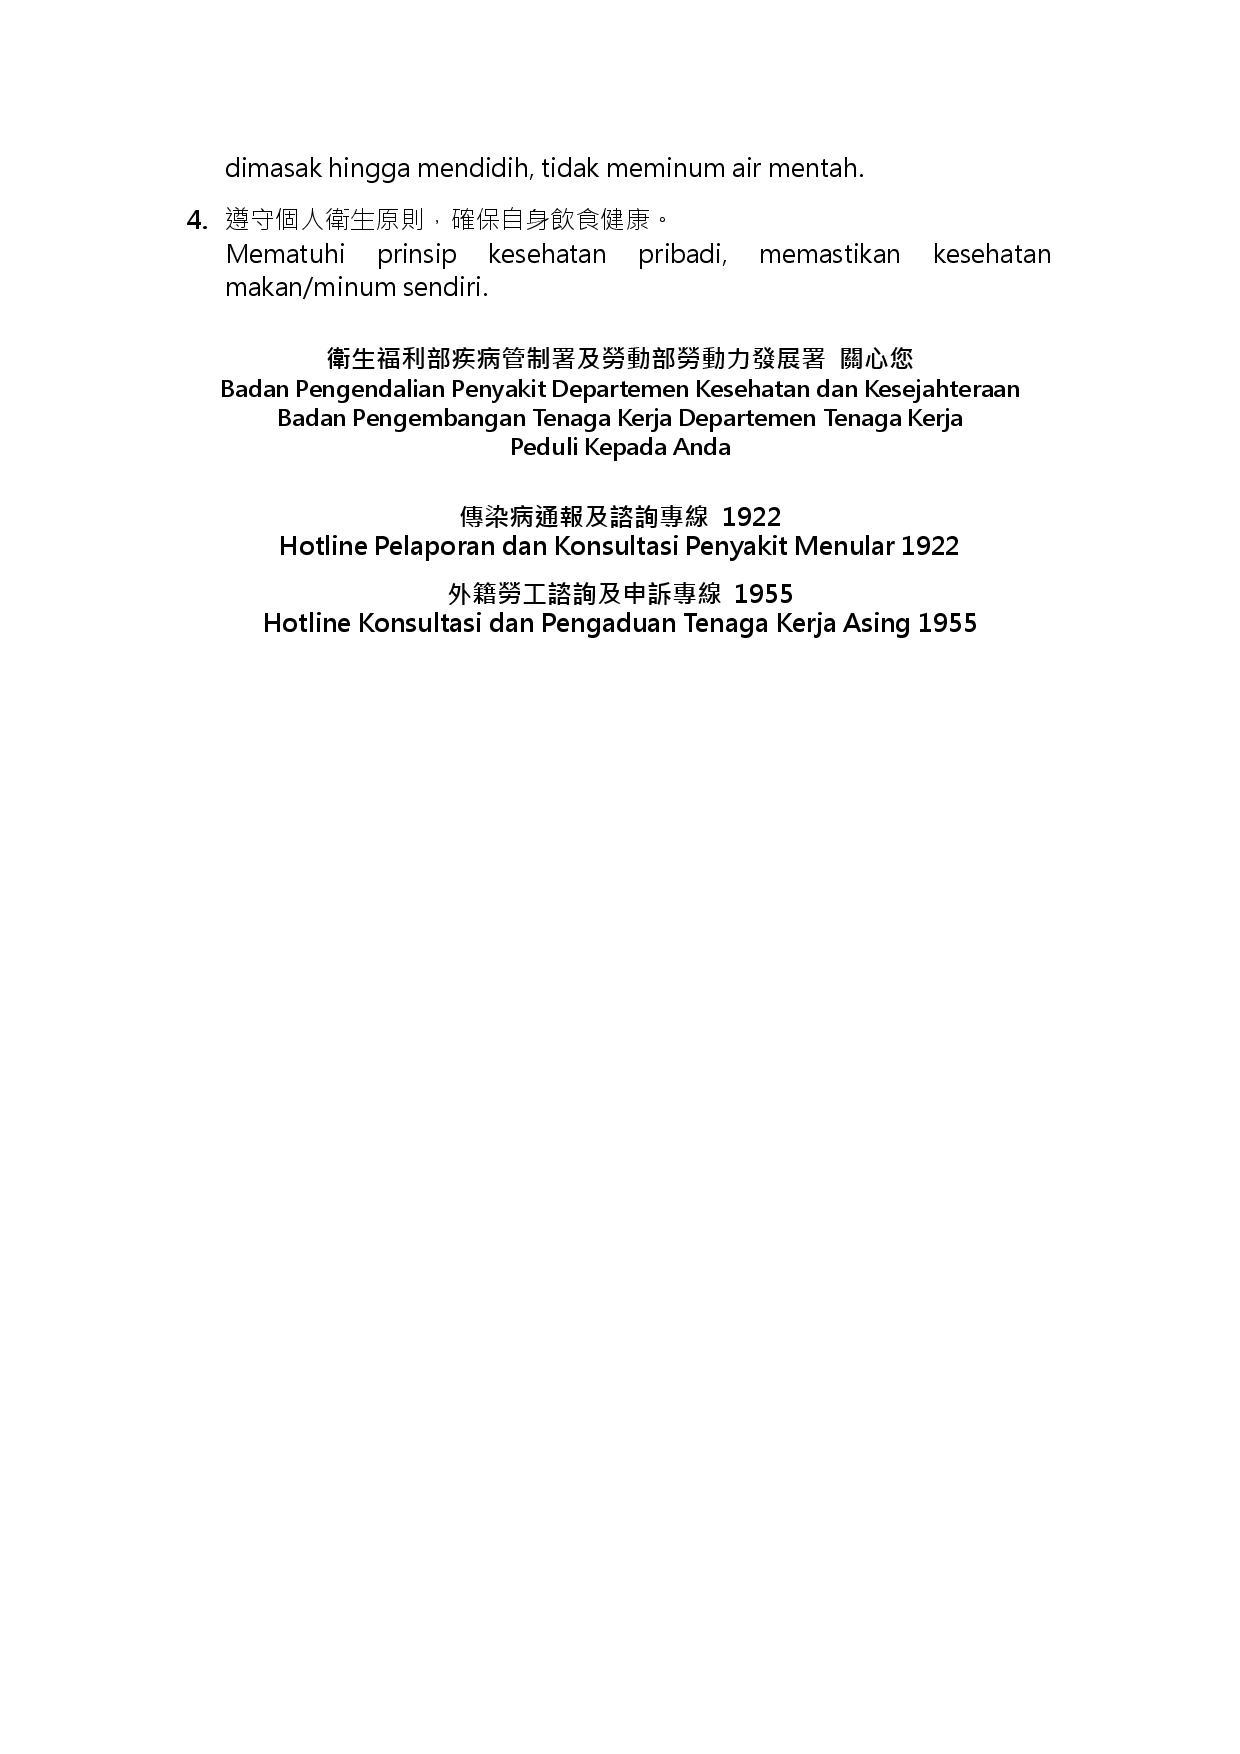 詳如附件【Klik】Mencegah Keracunan Makanan(Halaman 3)預防食品中毒(印尼文)